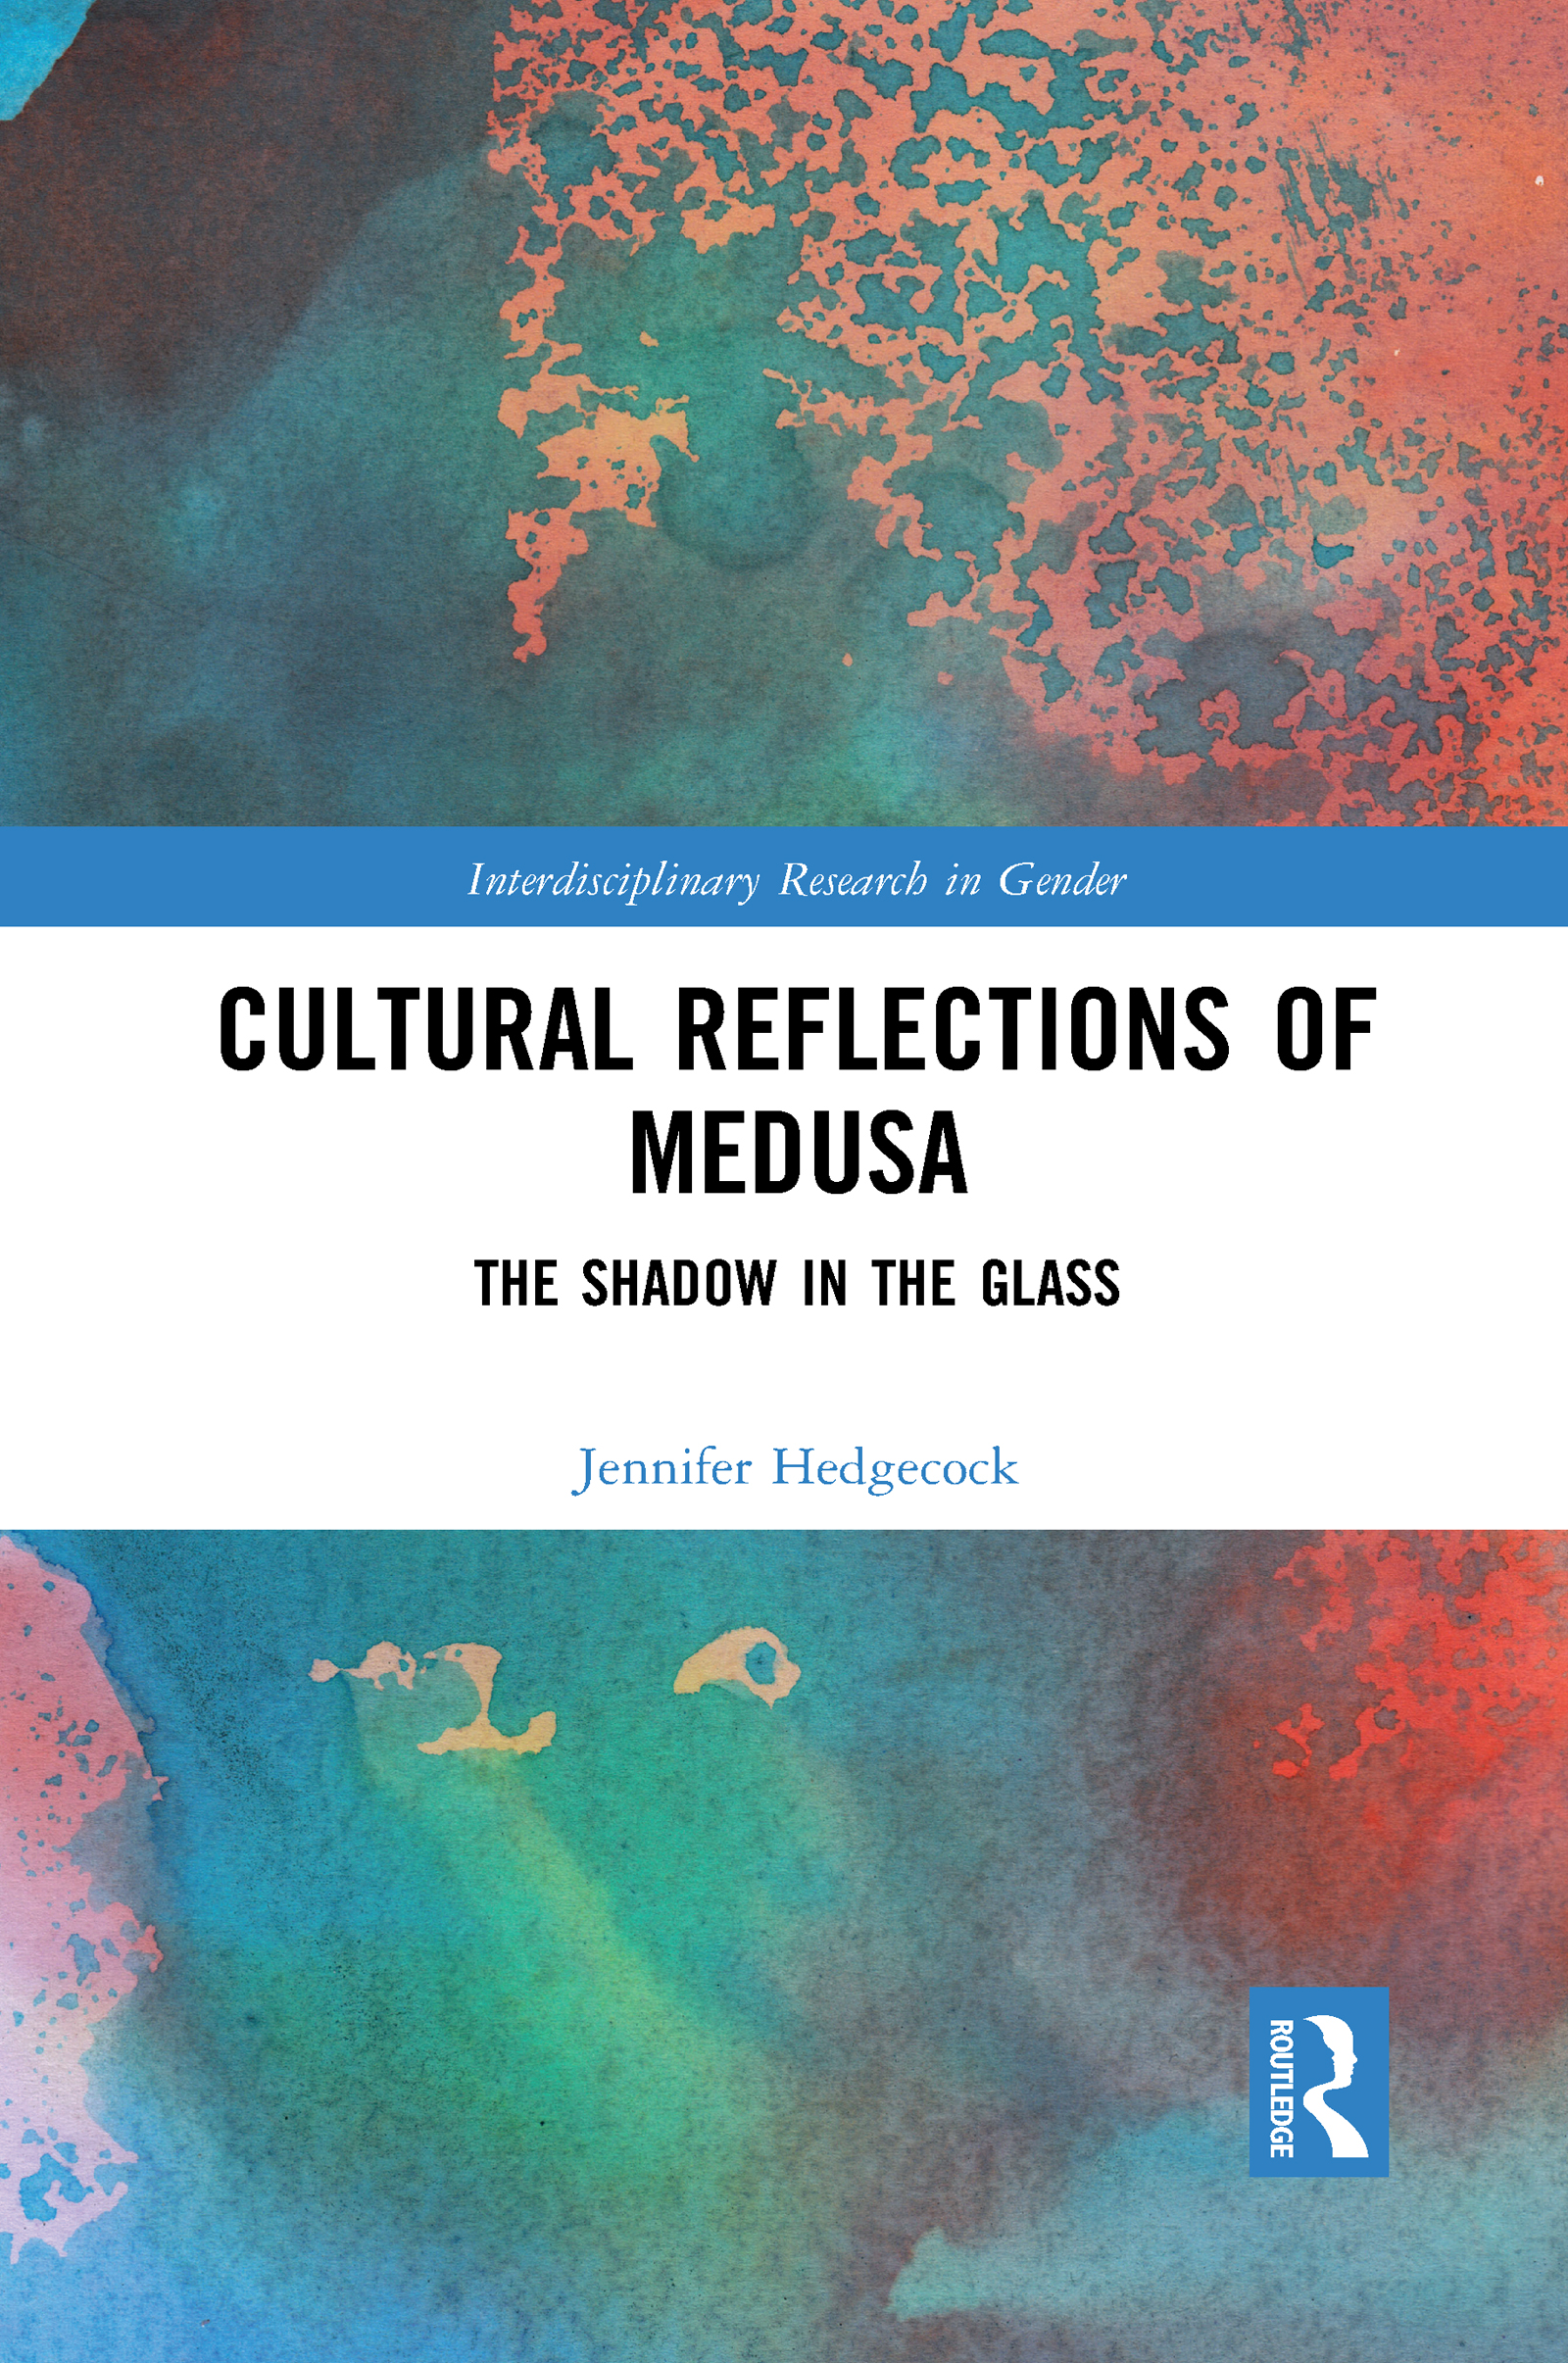 Cultural Reflections of Medusa